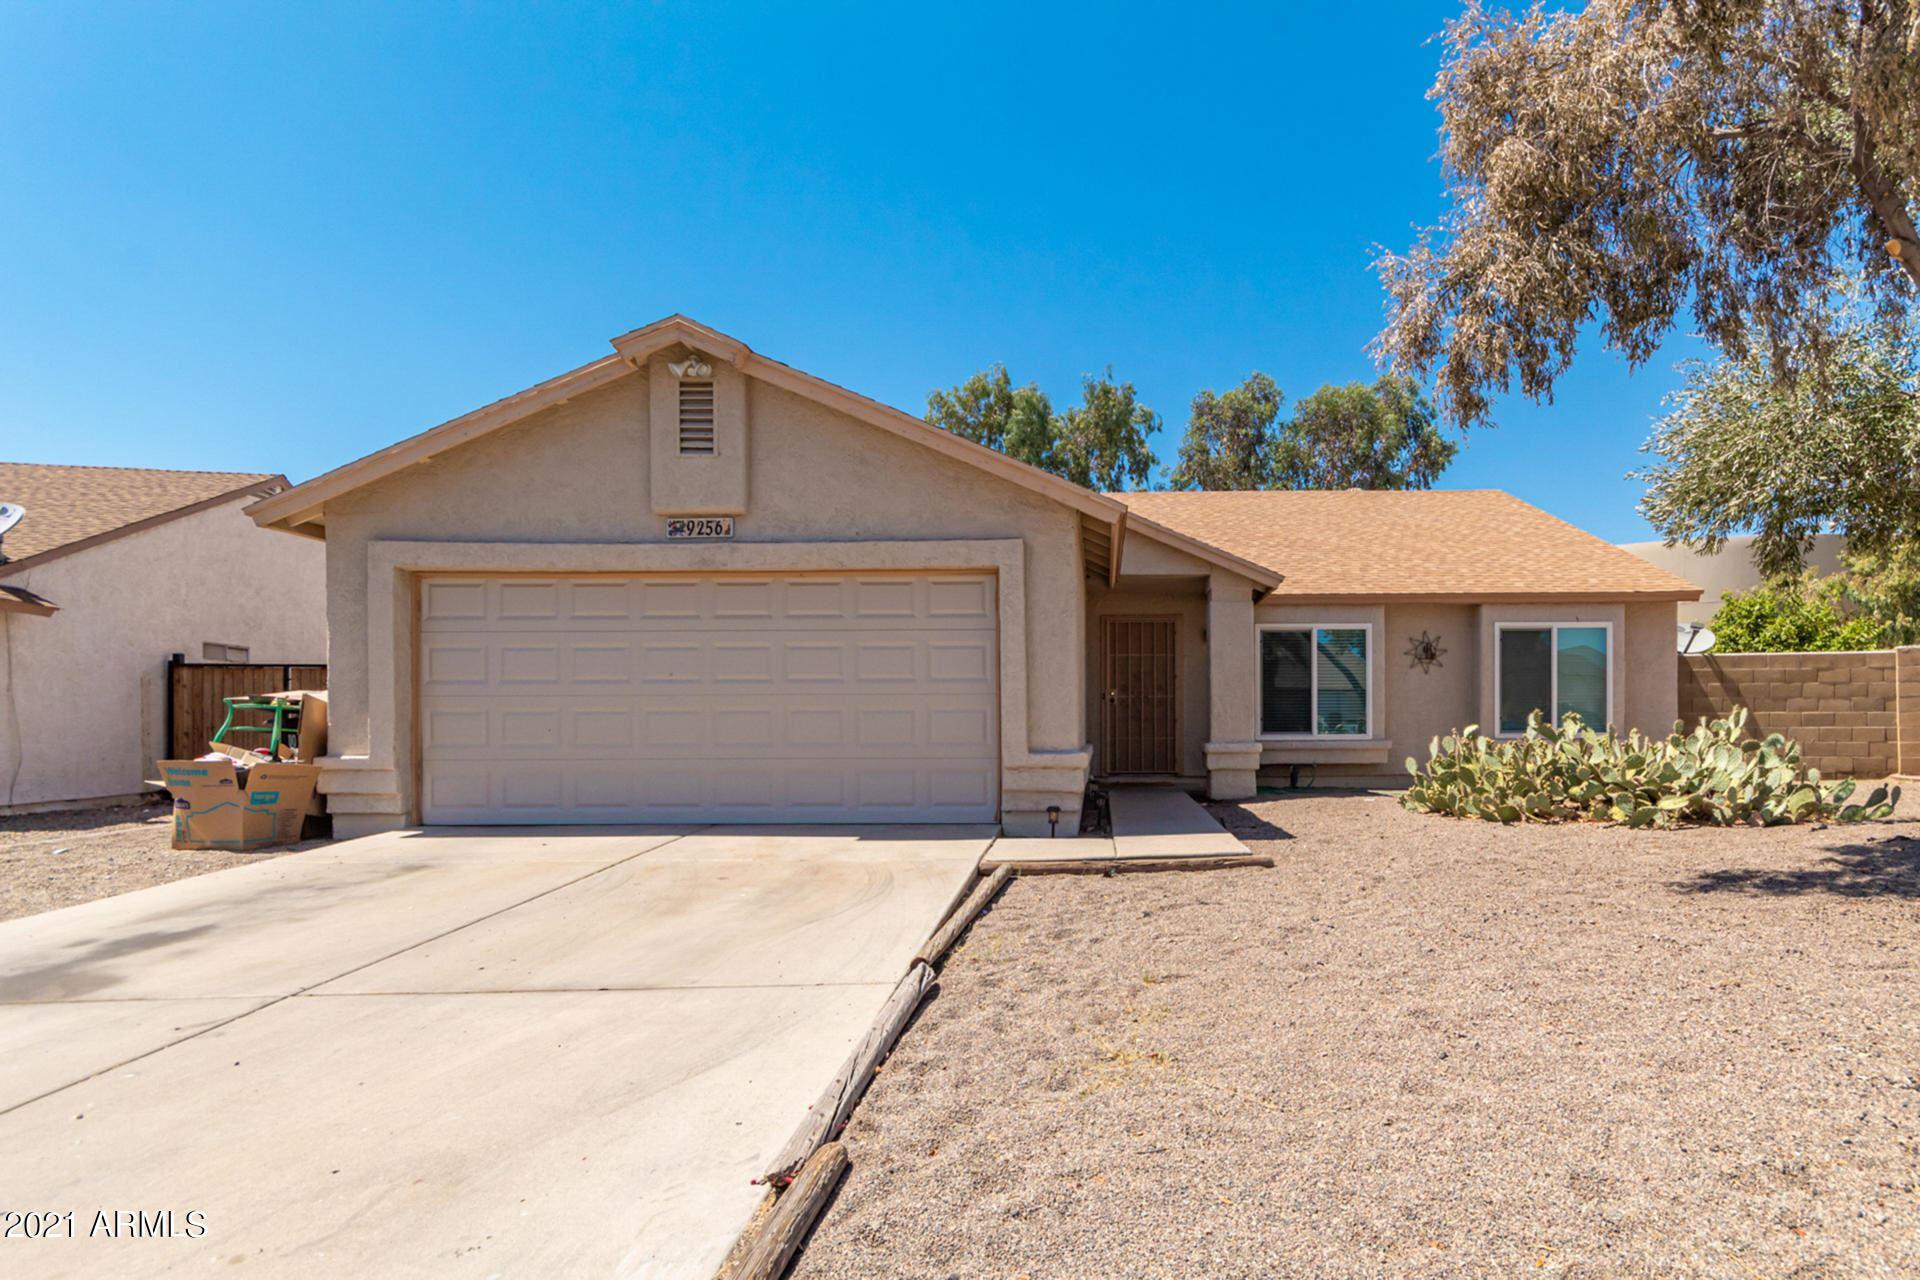 Photo of 9256 W CAMERON Drive, Peoria, AZ 85345 (MLS # 6249983)